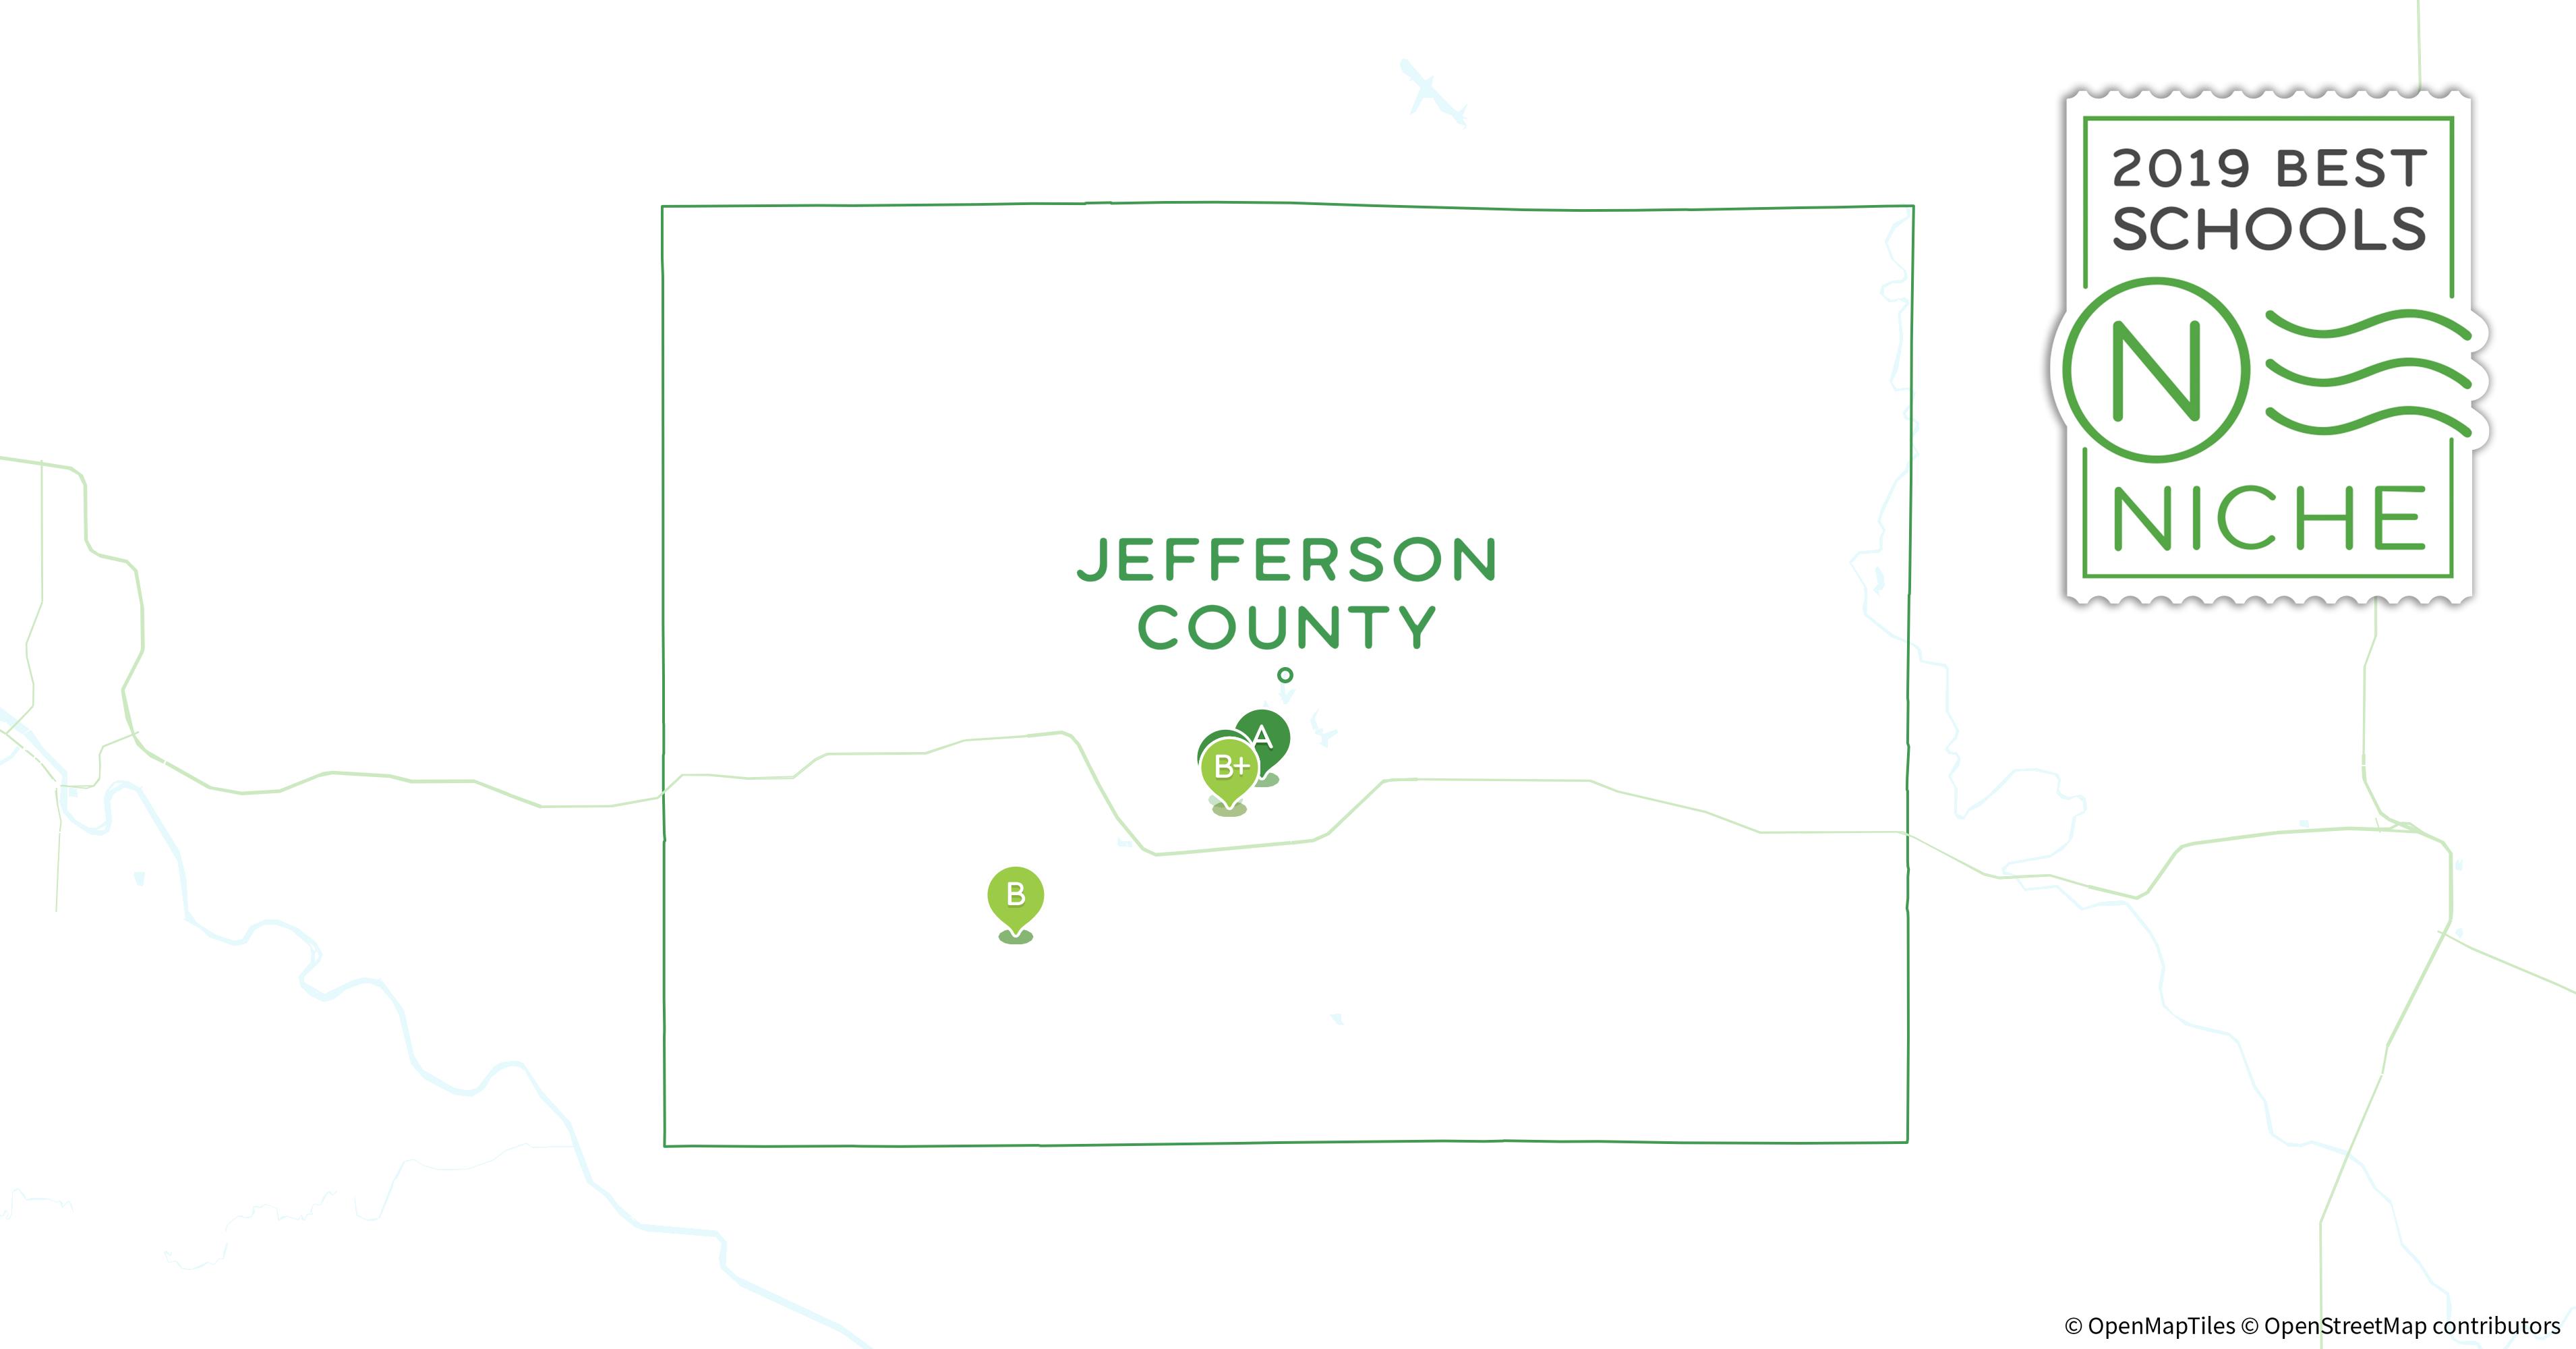 Jefferson County Iowa Map.School Districts In Jefferson County Ia Niche